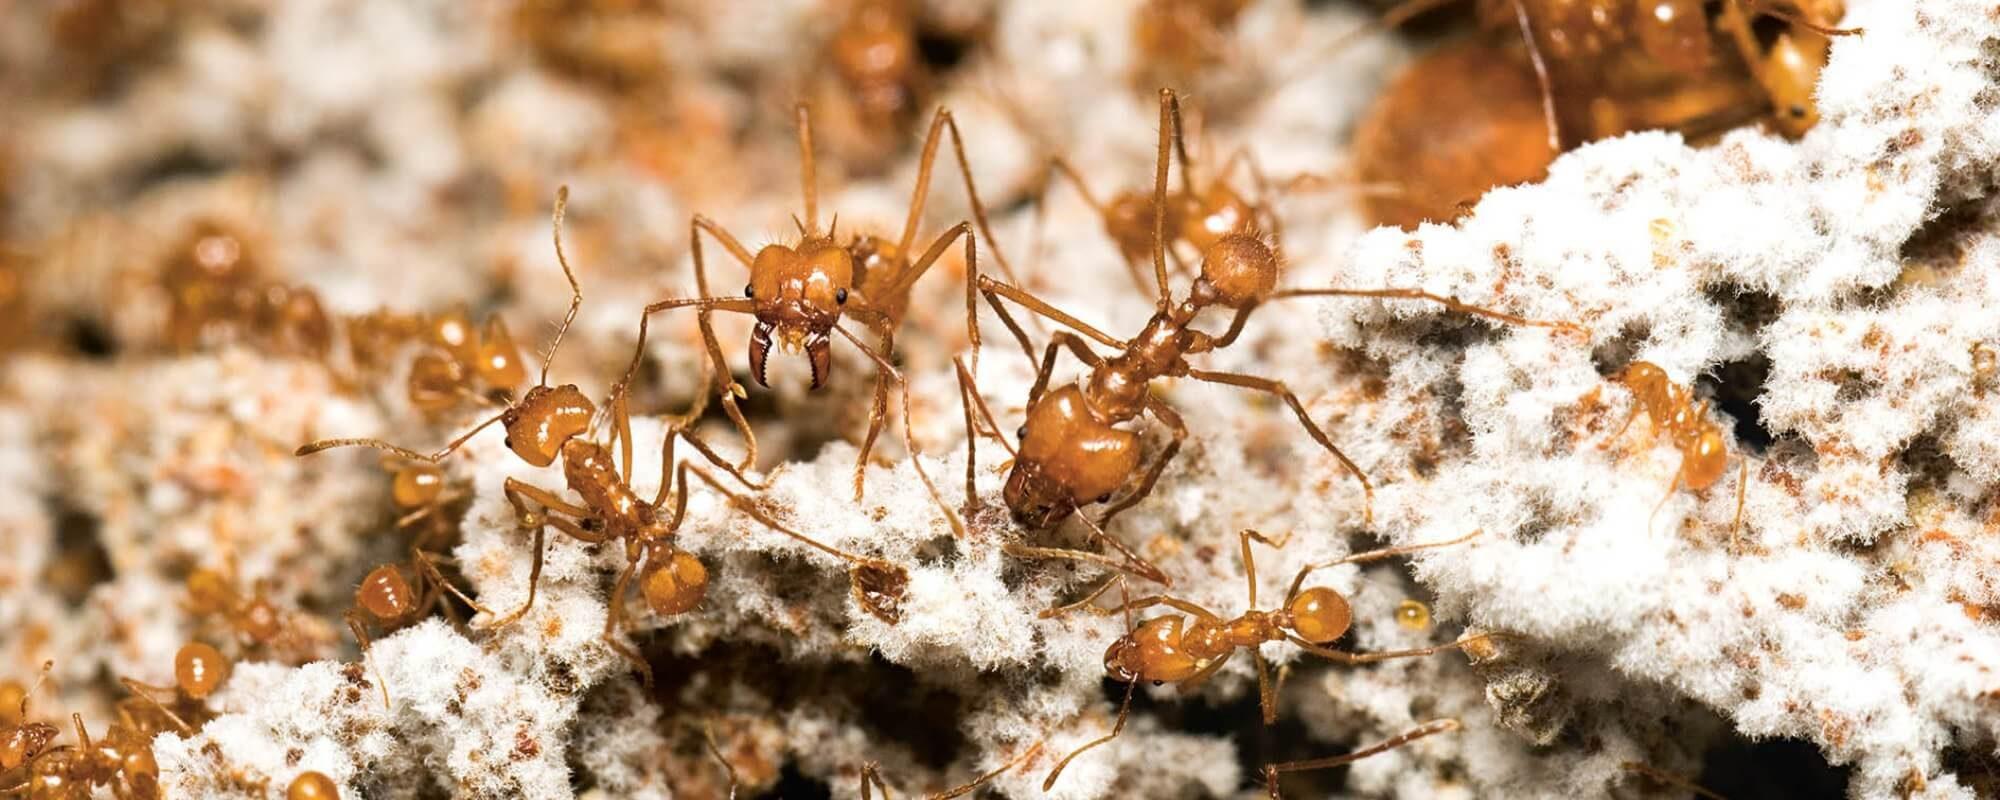 ant-fungus-farmers